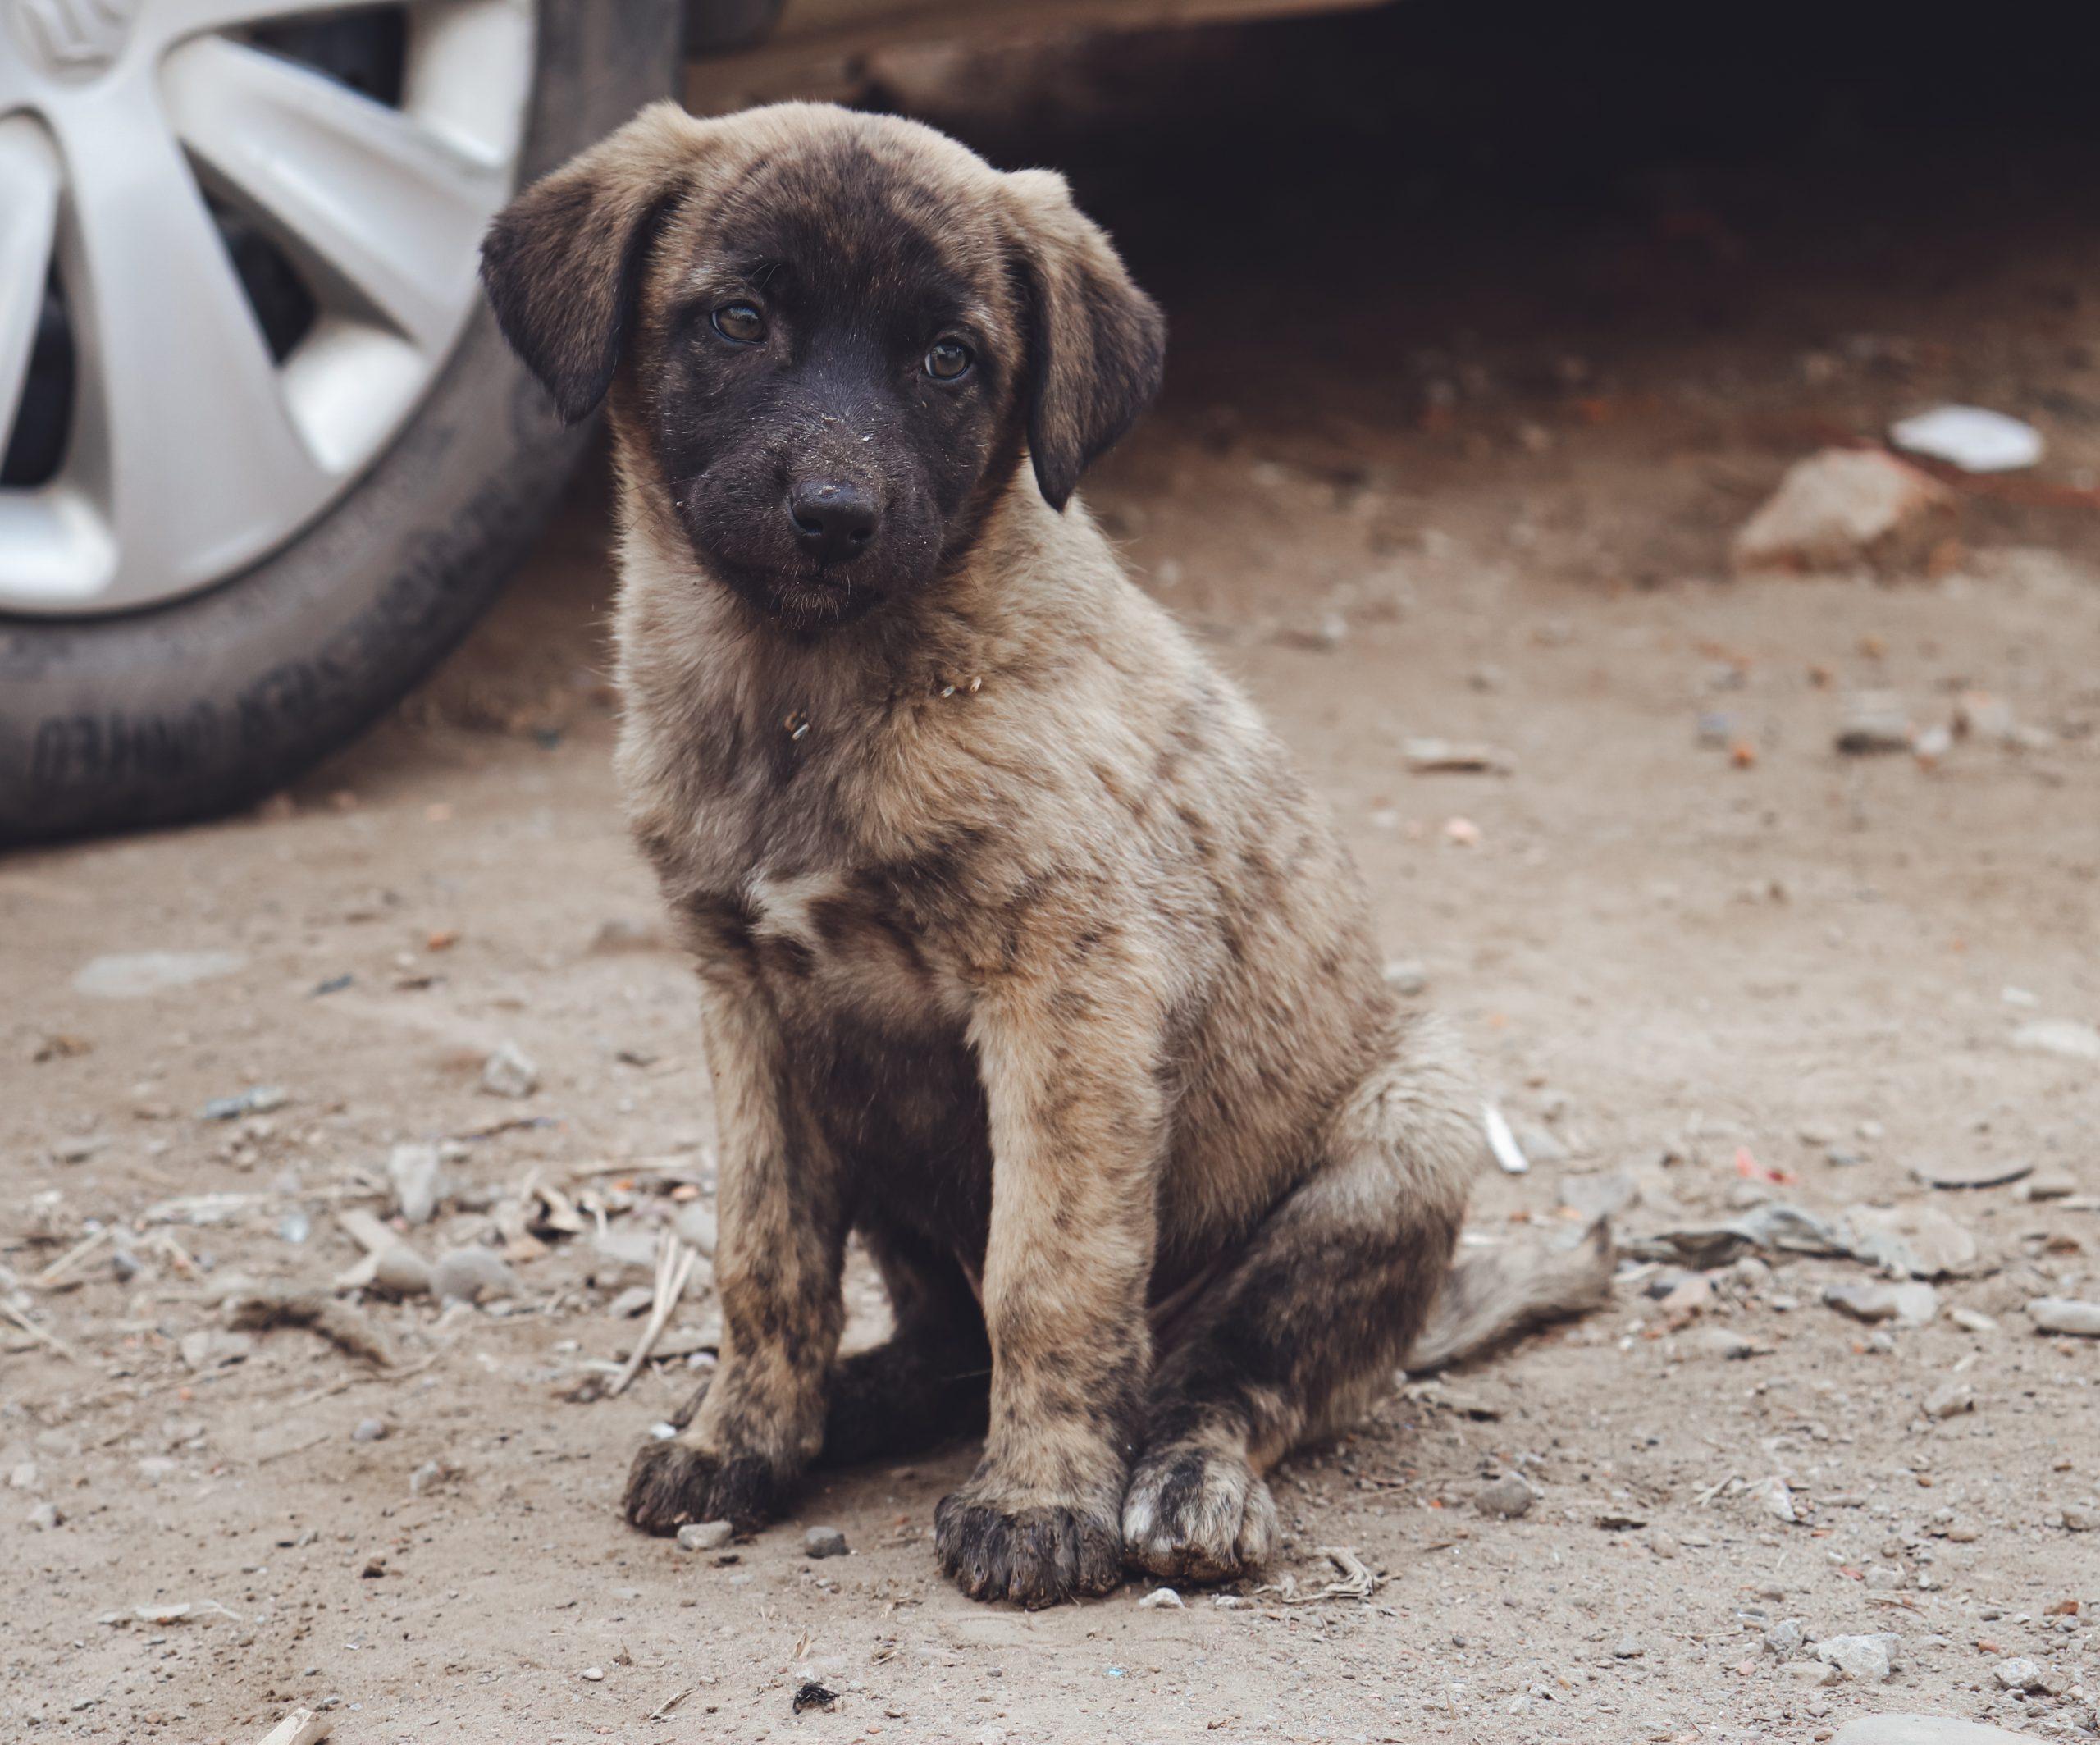 Puppy sitting on road